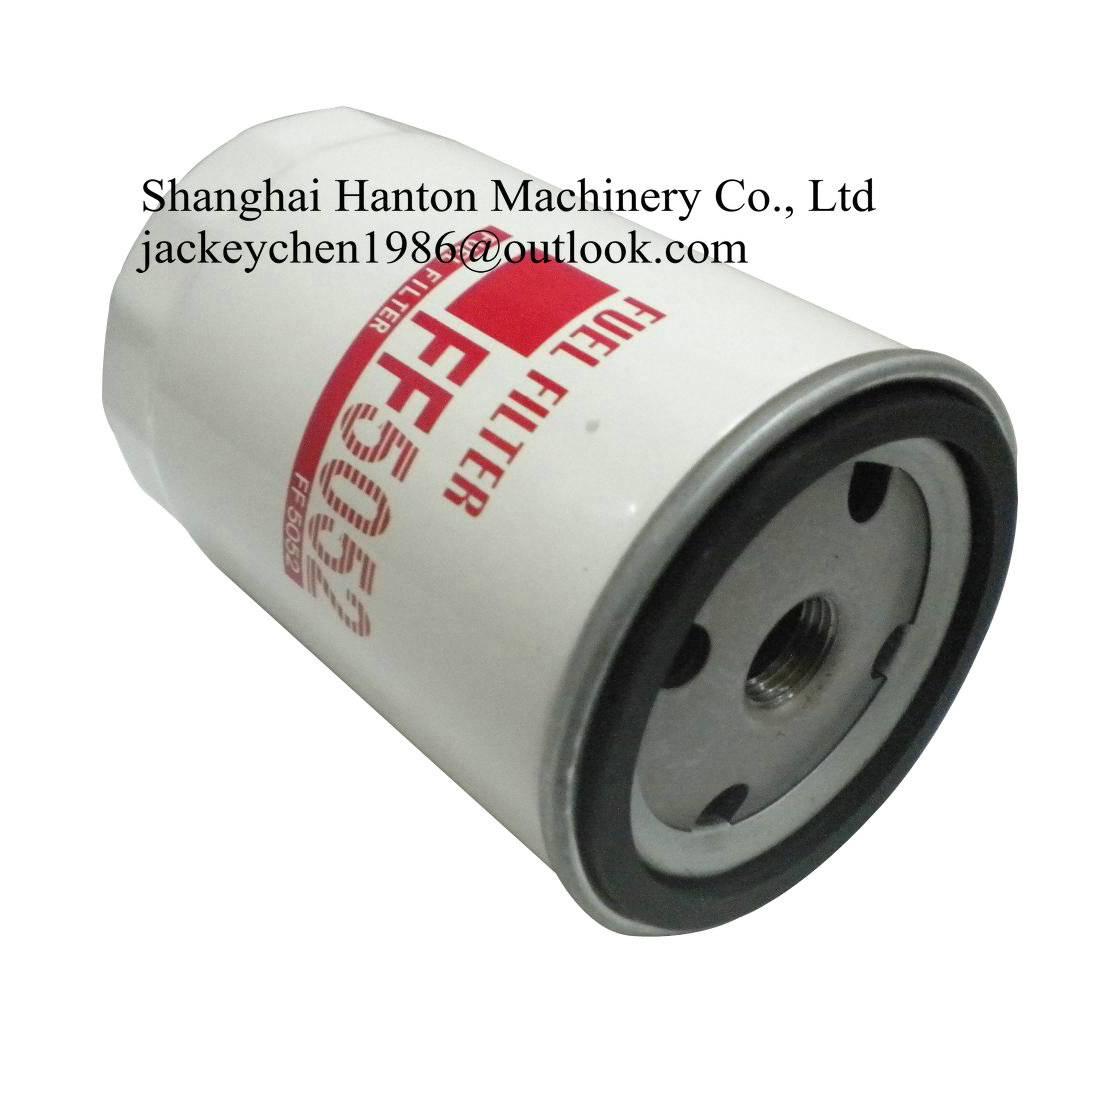 Sell Cummins 6BT diesel enginf fuel filter FF5052 3931063 3313306 FF202